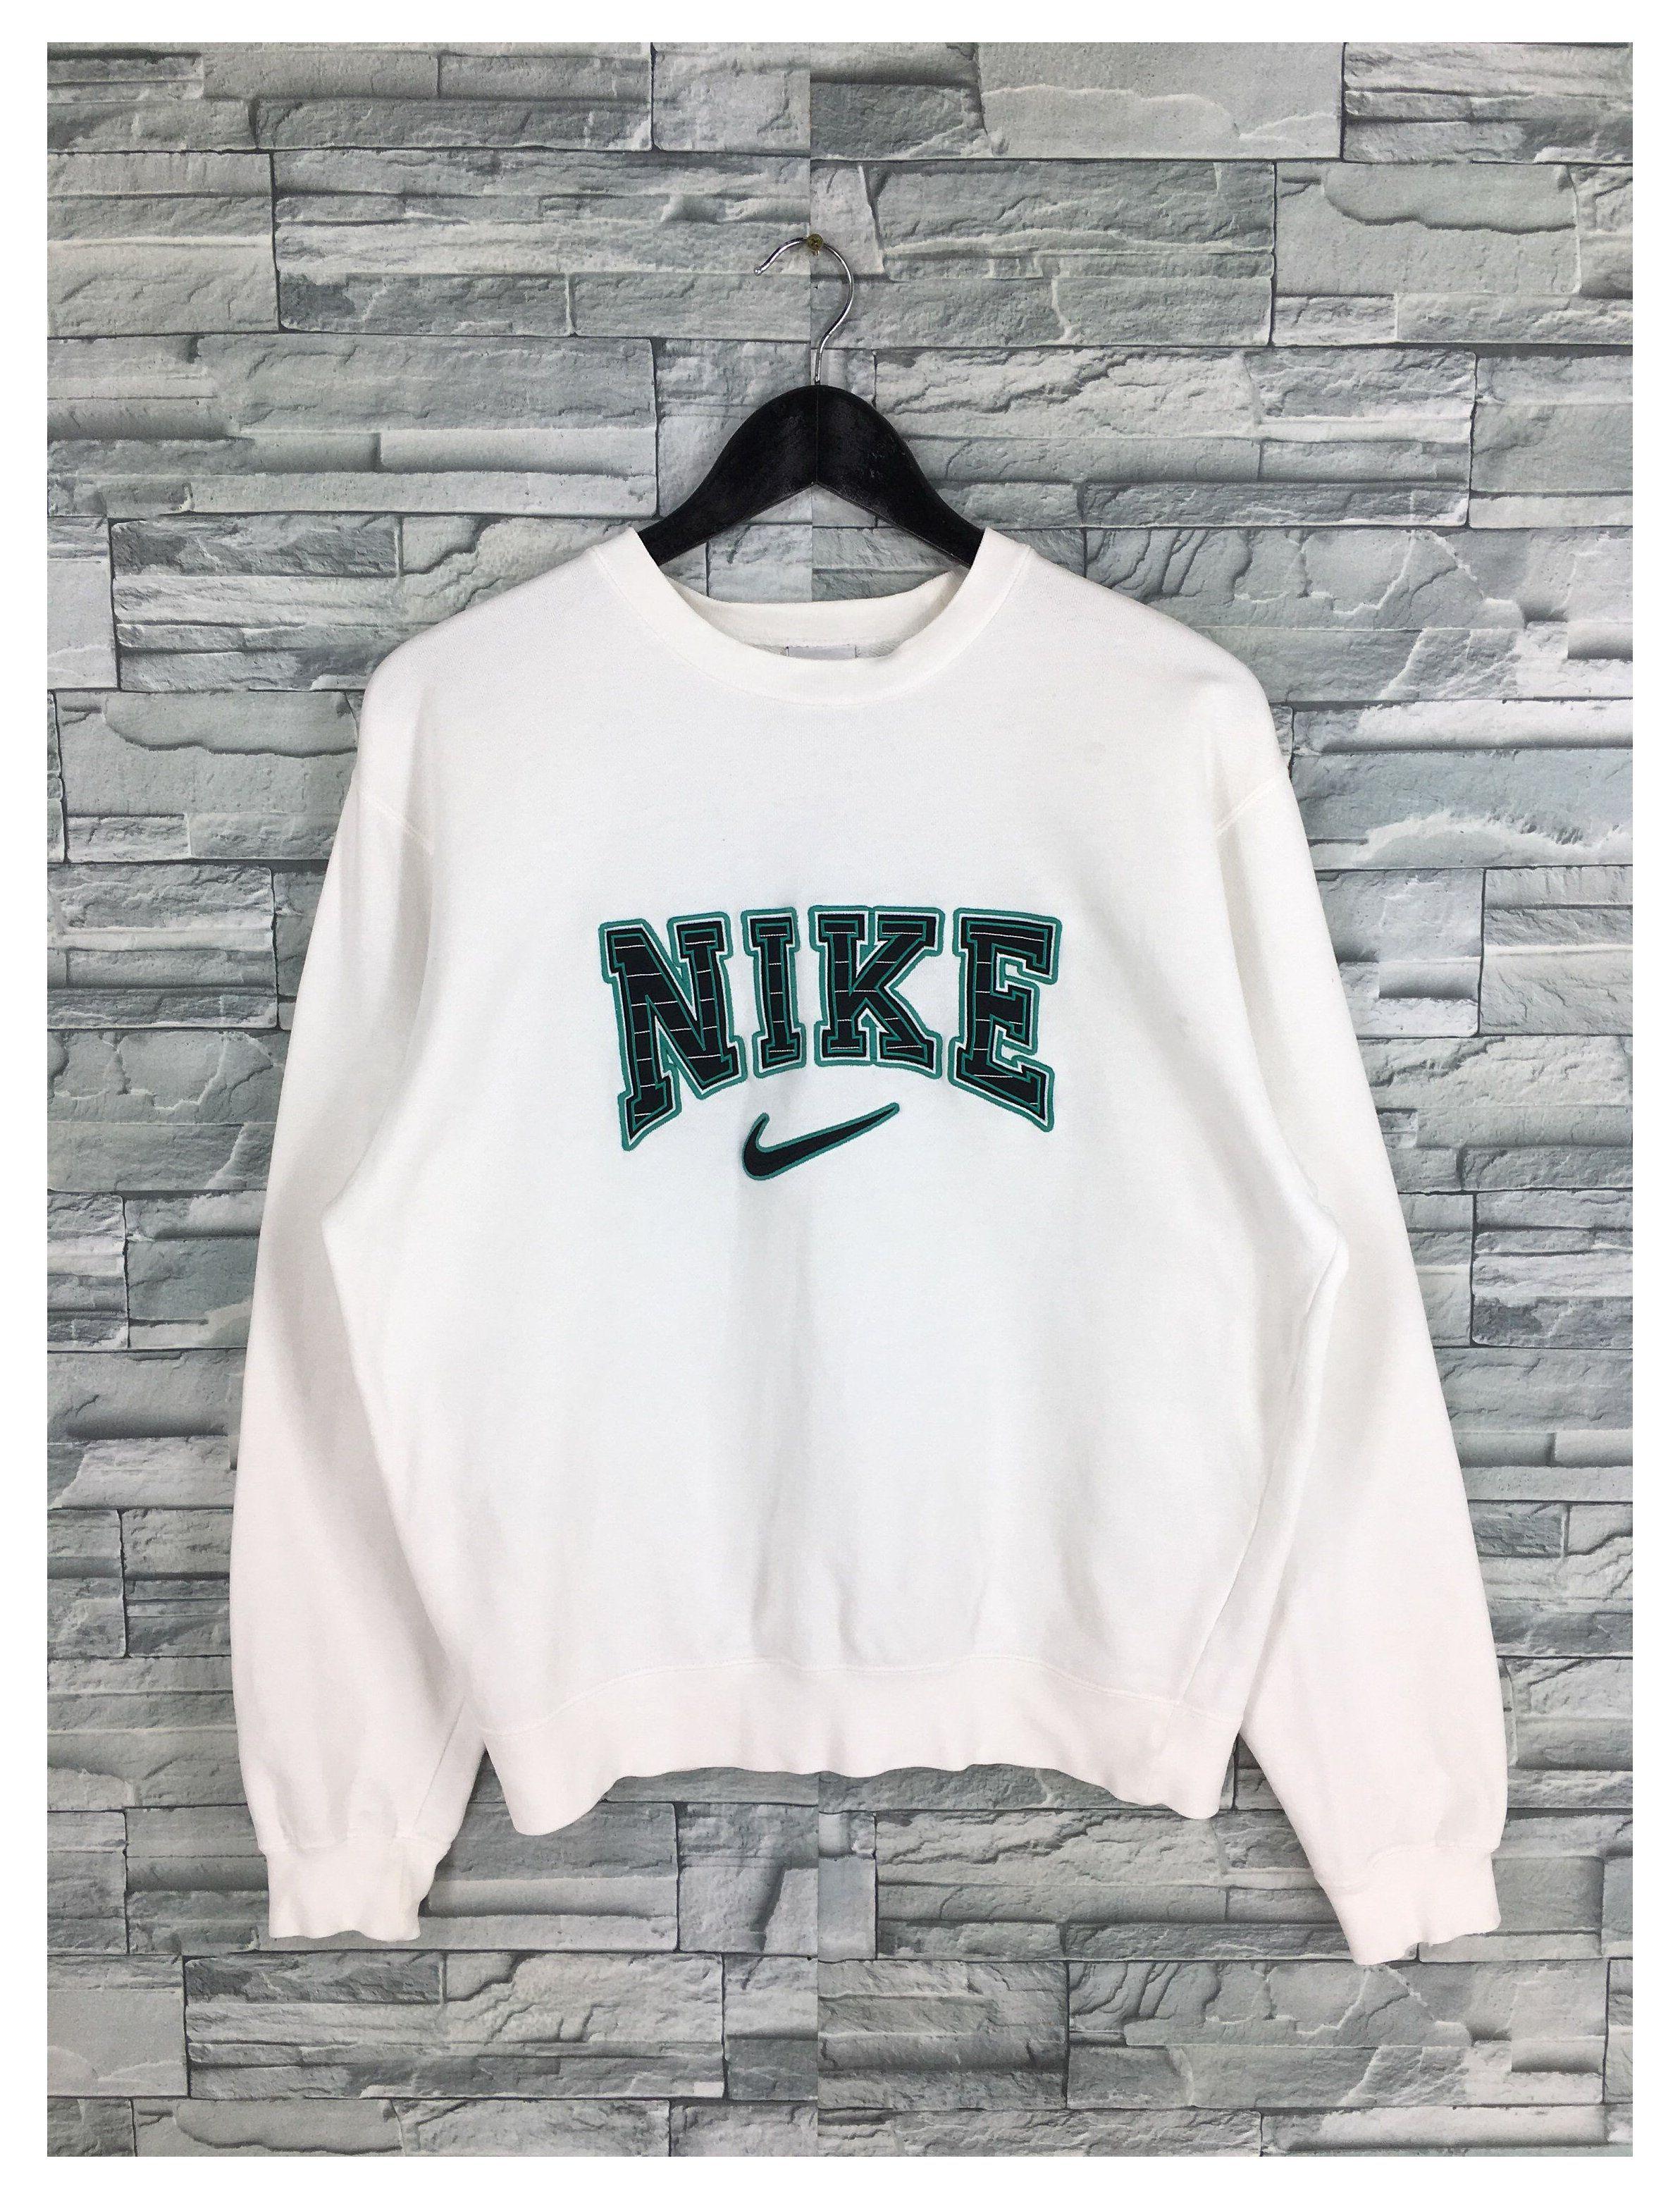 Vintage Nike Sweatshirt Pullover White Medium 90 S Nike Etsy White Vintage Nike Jumper Whit In 2021 Vintage Nike Sweatshirt Vintage Hoodies Pullover Sweatshirts [ 3120 x 2384 Pixel ]